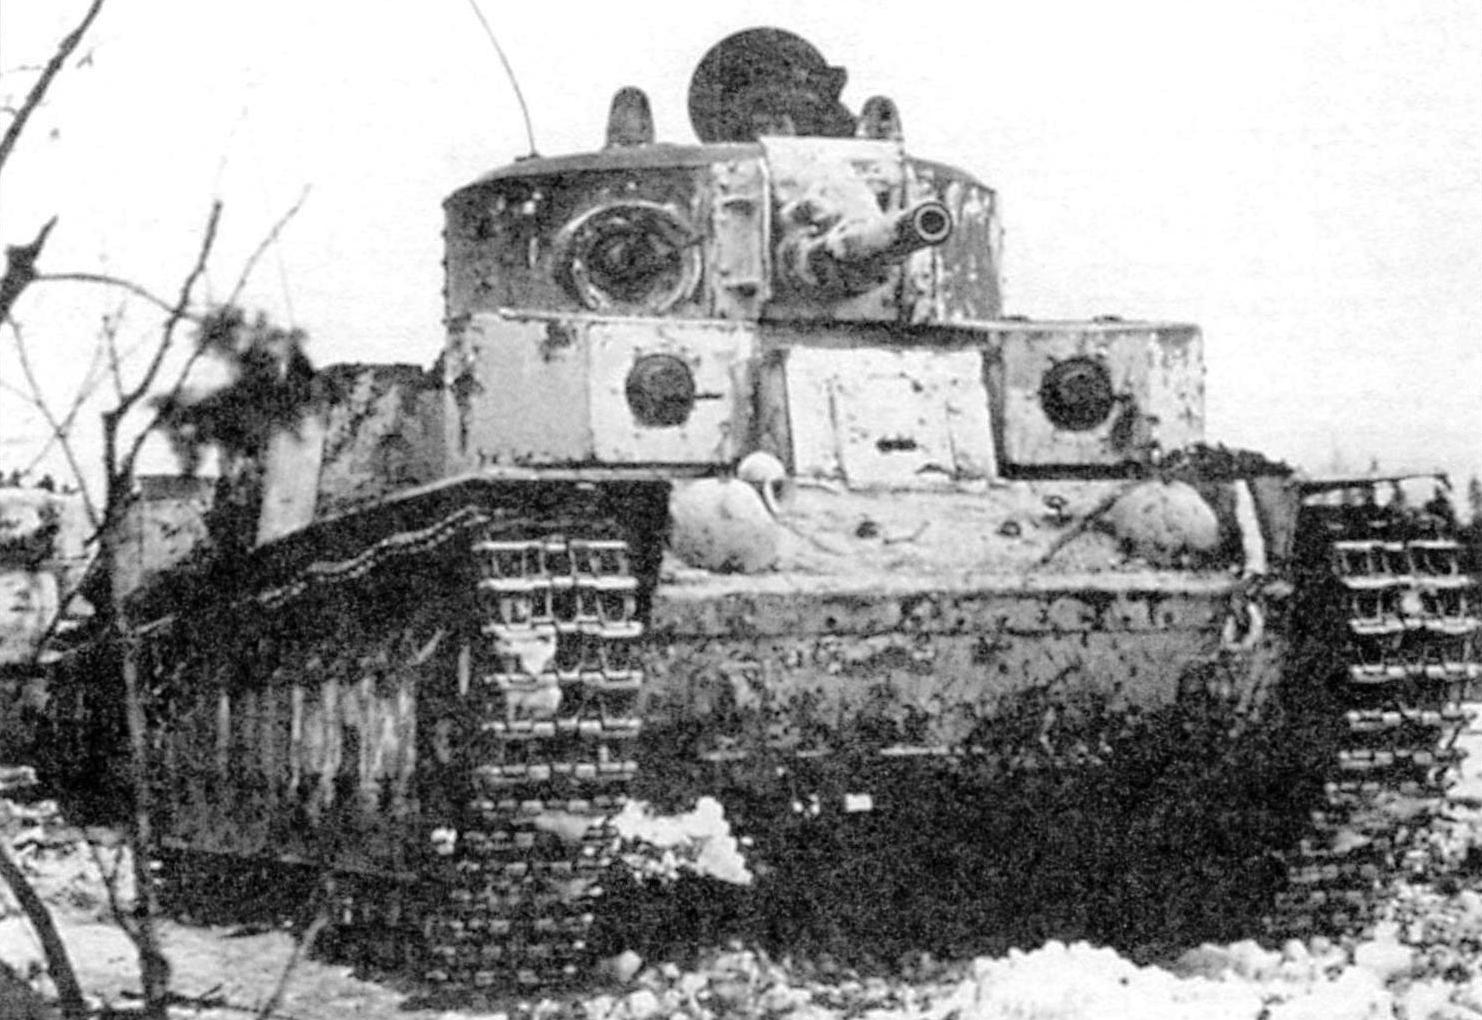 T-28 in an ambush on the Karelian isthmus. Winter war, 1940